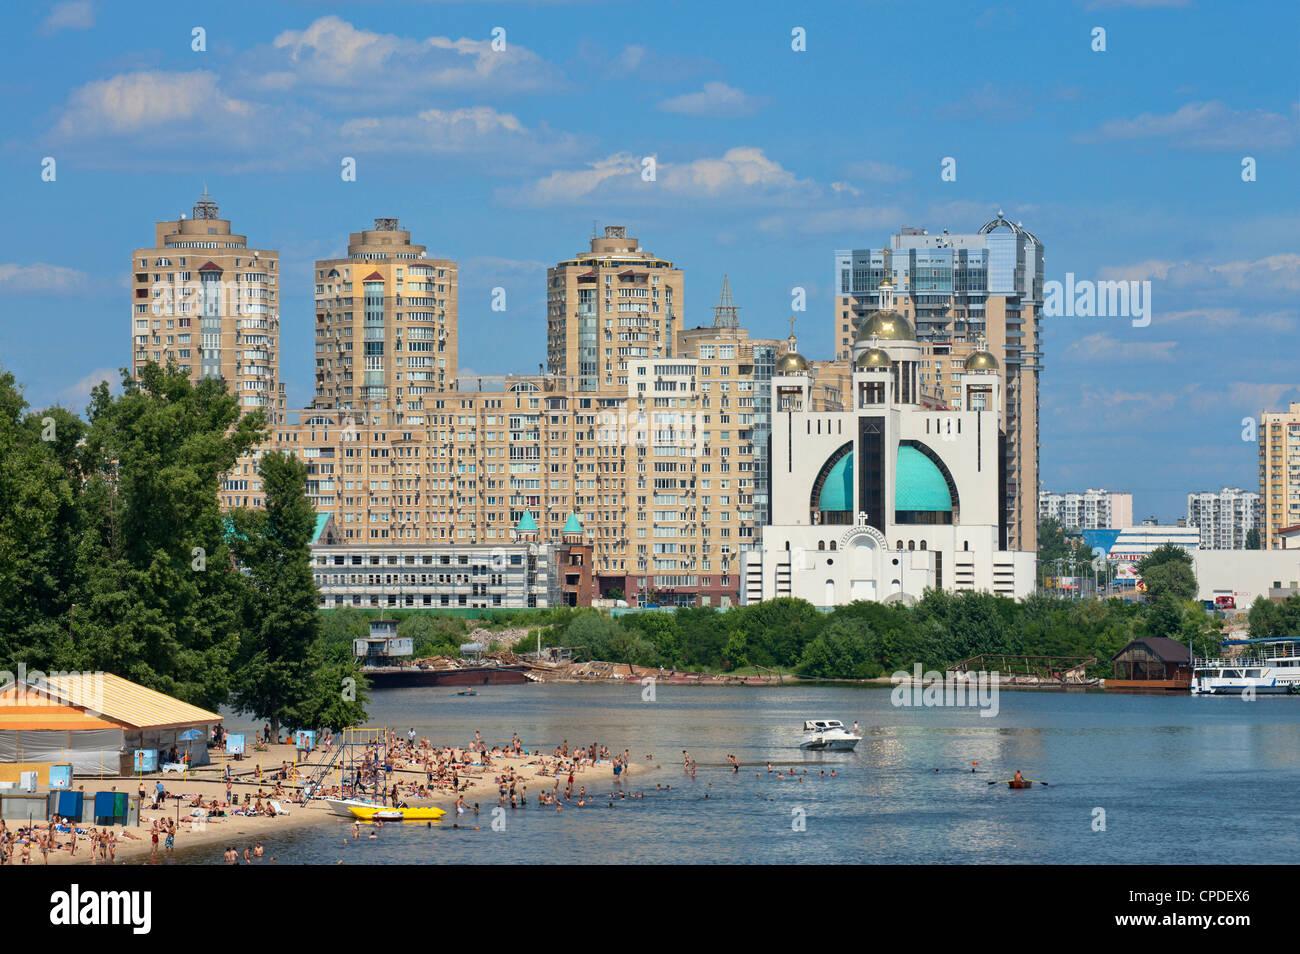 View towards the International Exhibition Centre and Livoberezhnyi from Hidropark, Kiev, Ukraine, Europe Stock Photo